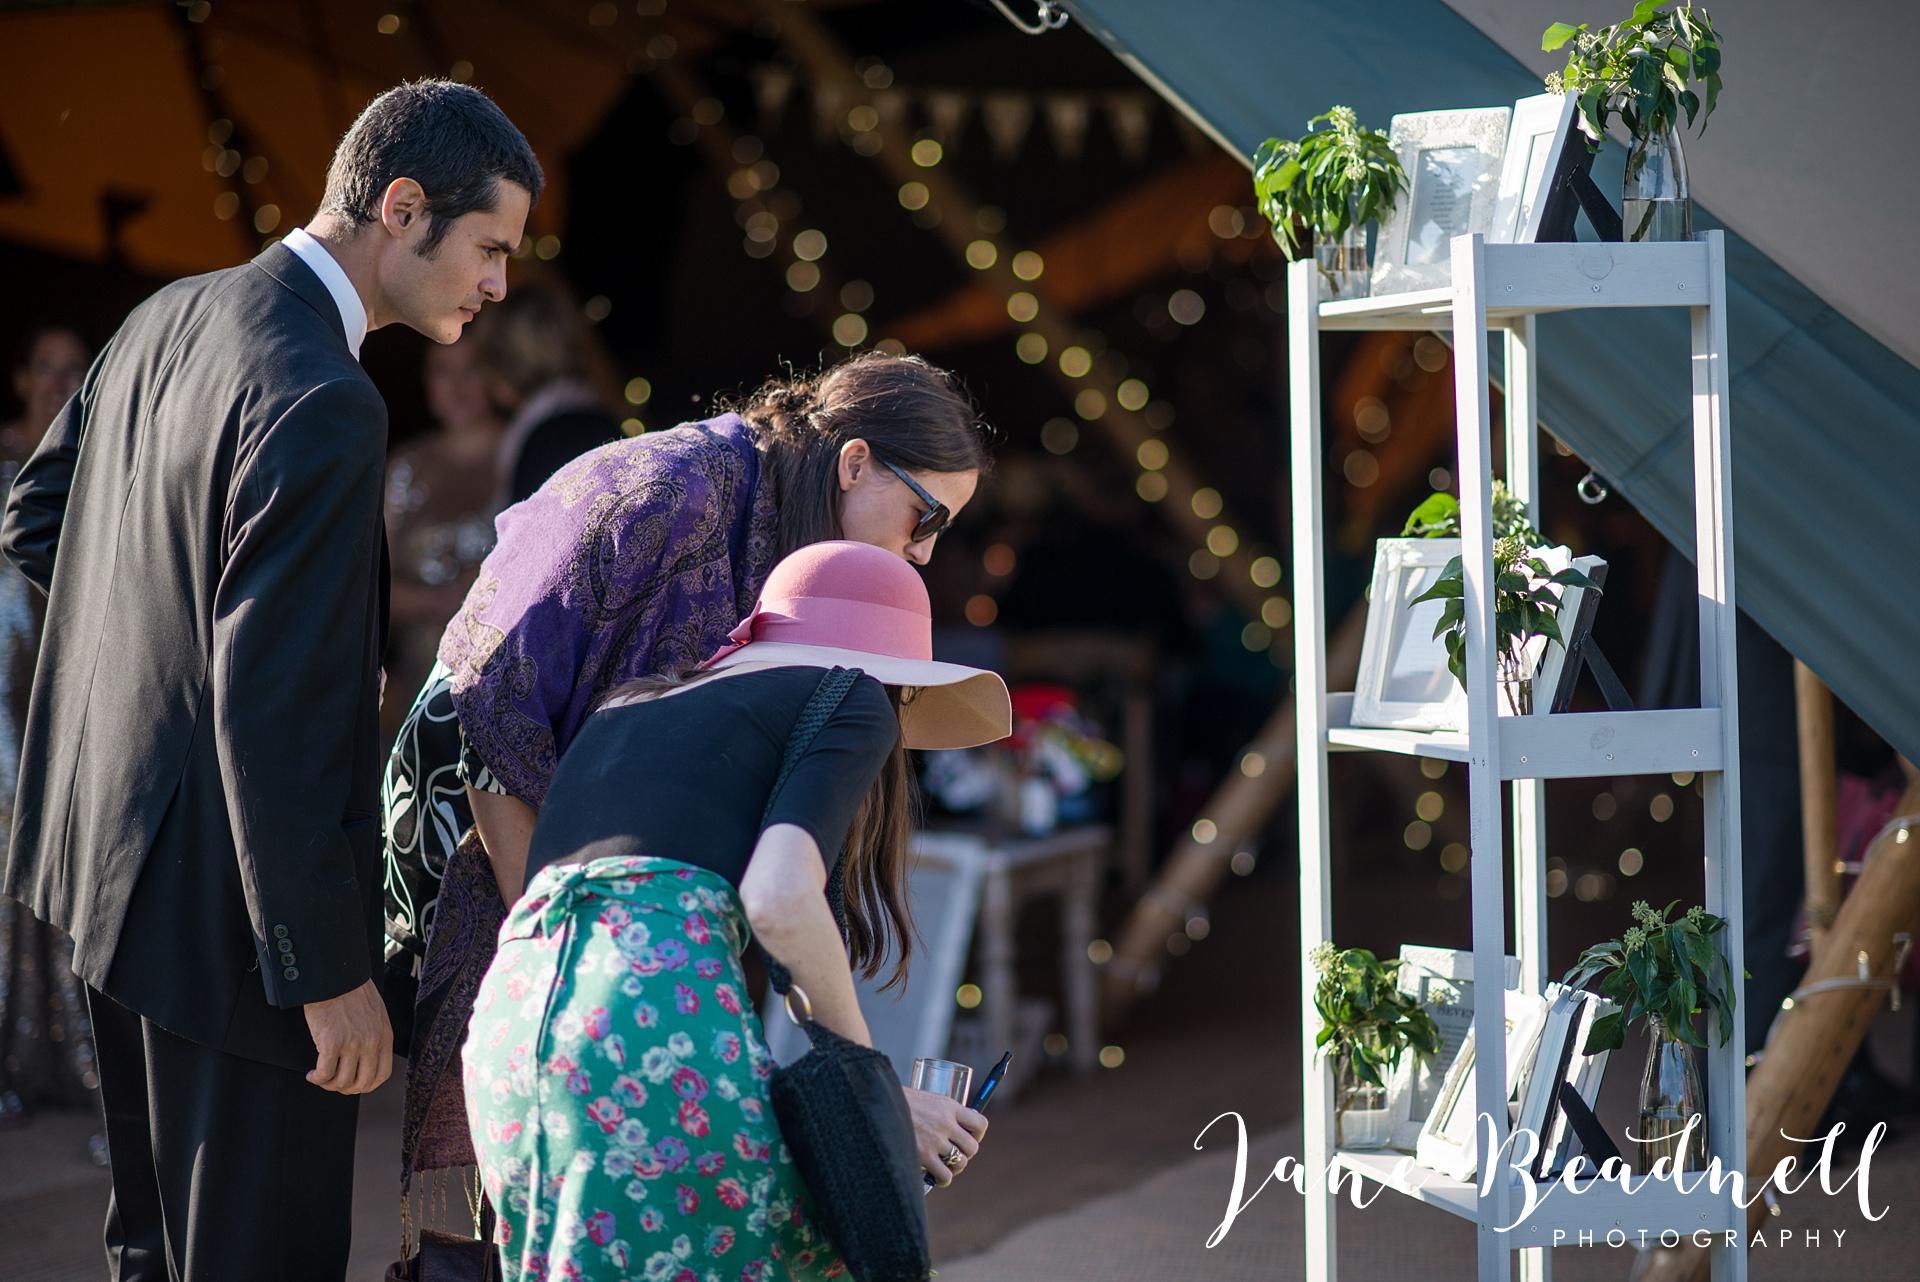 fine-art-wedding-photographer-jane-beadnell-yorkshire-wedding-photographer_0118